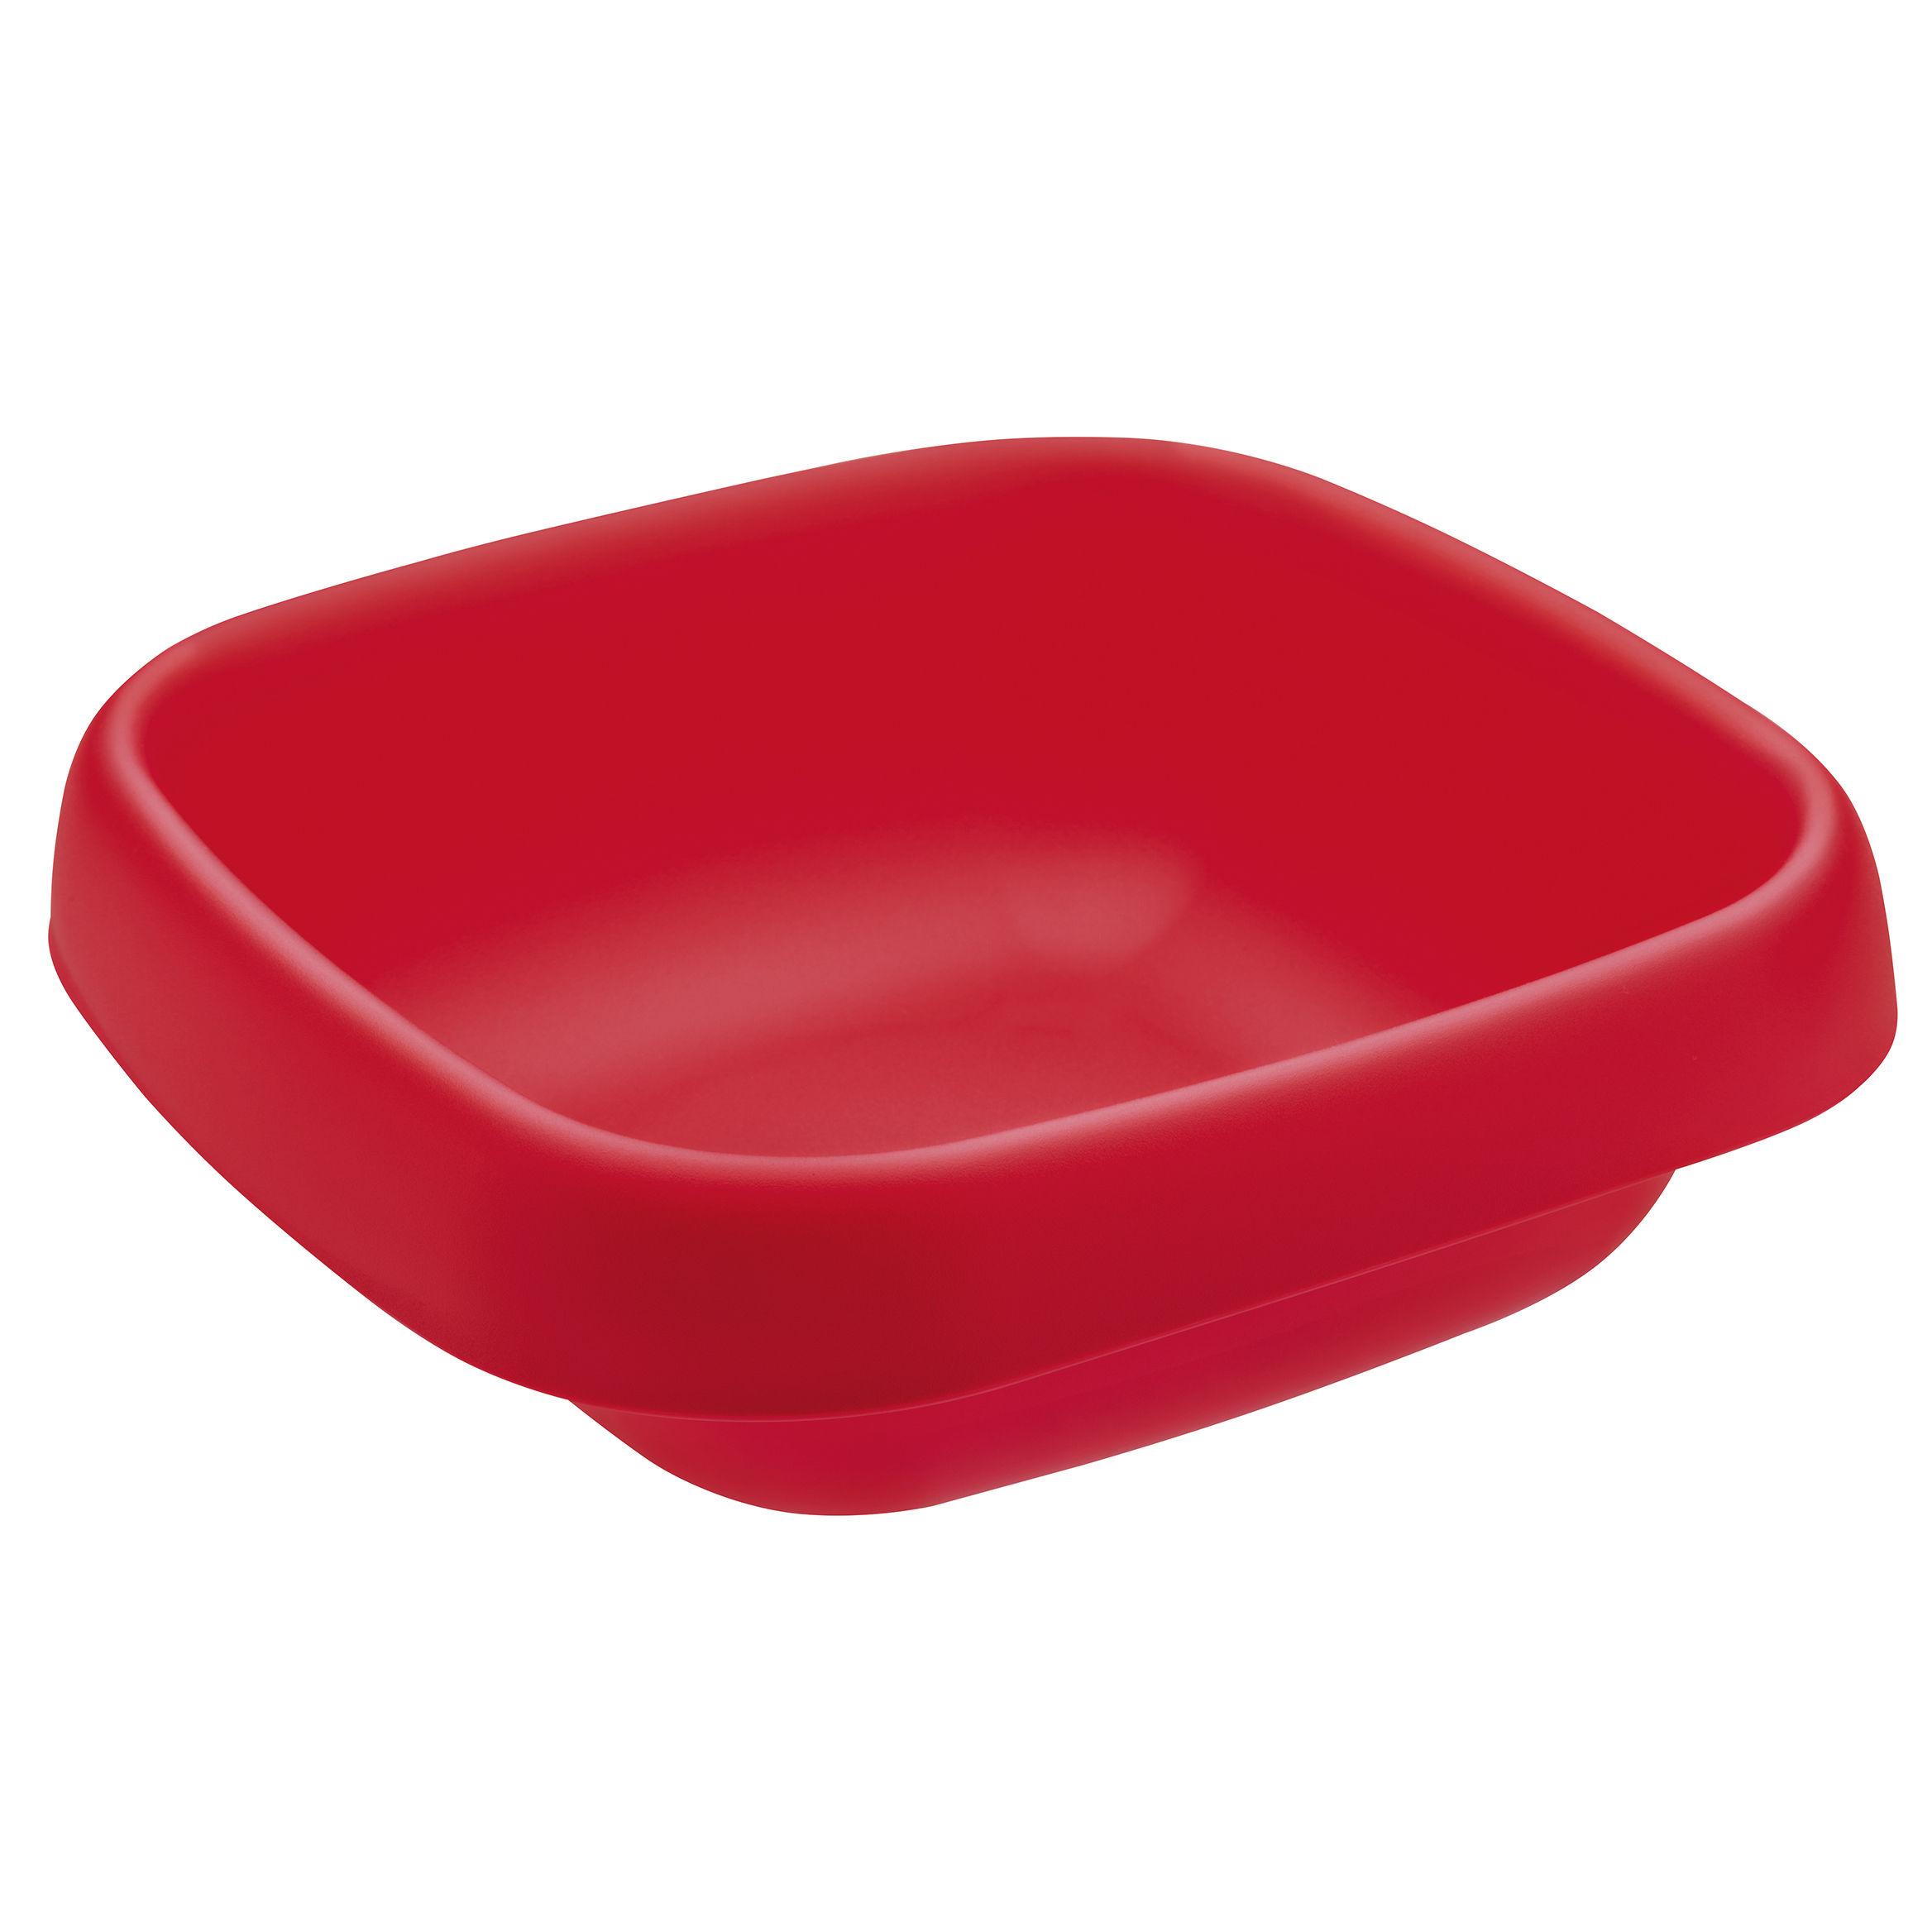 corbeille pain brad rouge framboise koziol. Black Bedroom Furniture Sets. Home Design Ideas